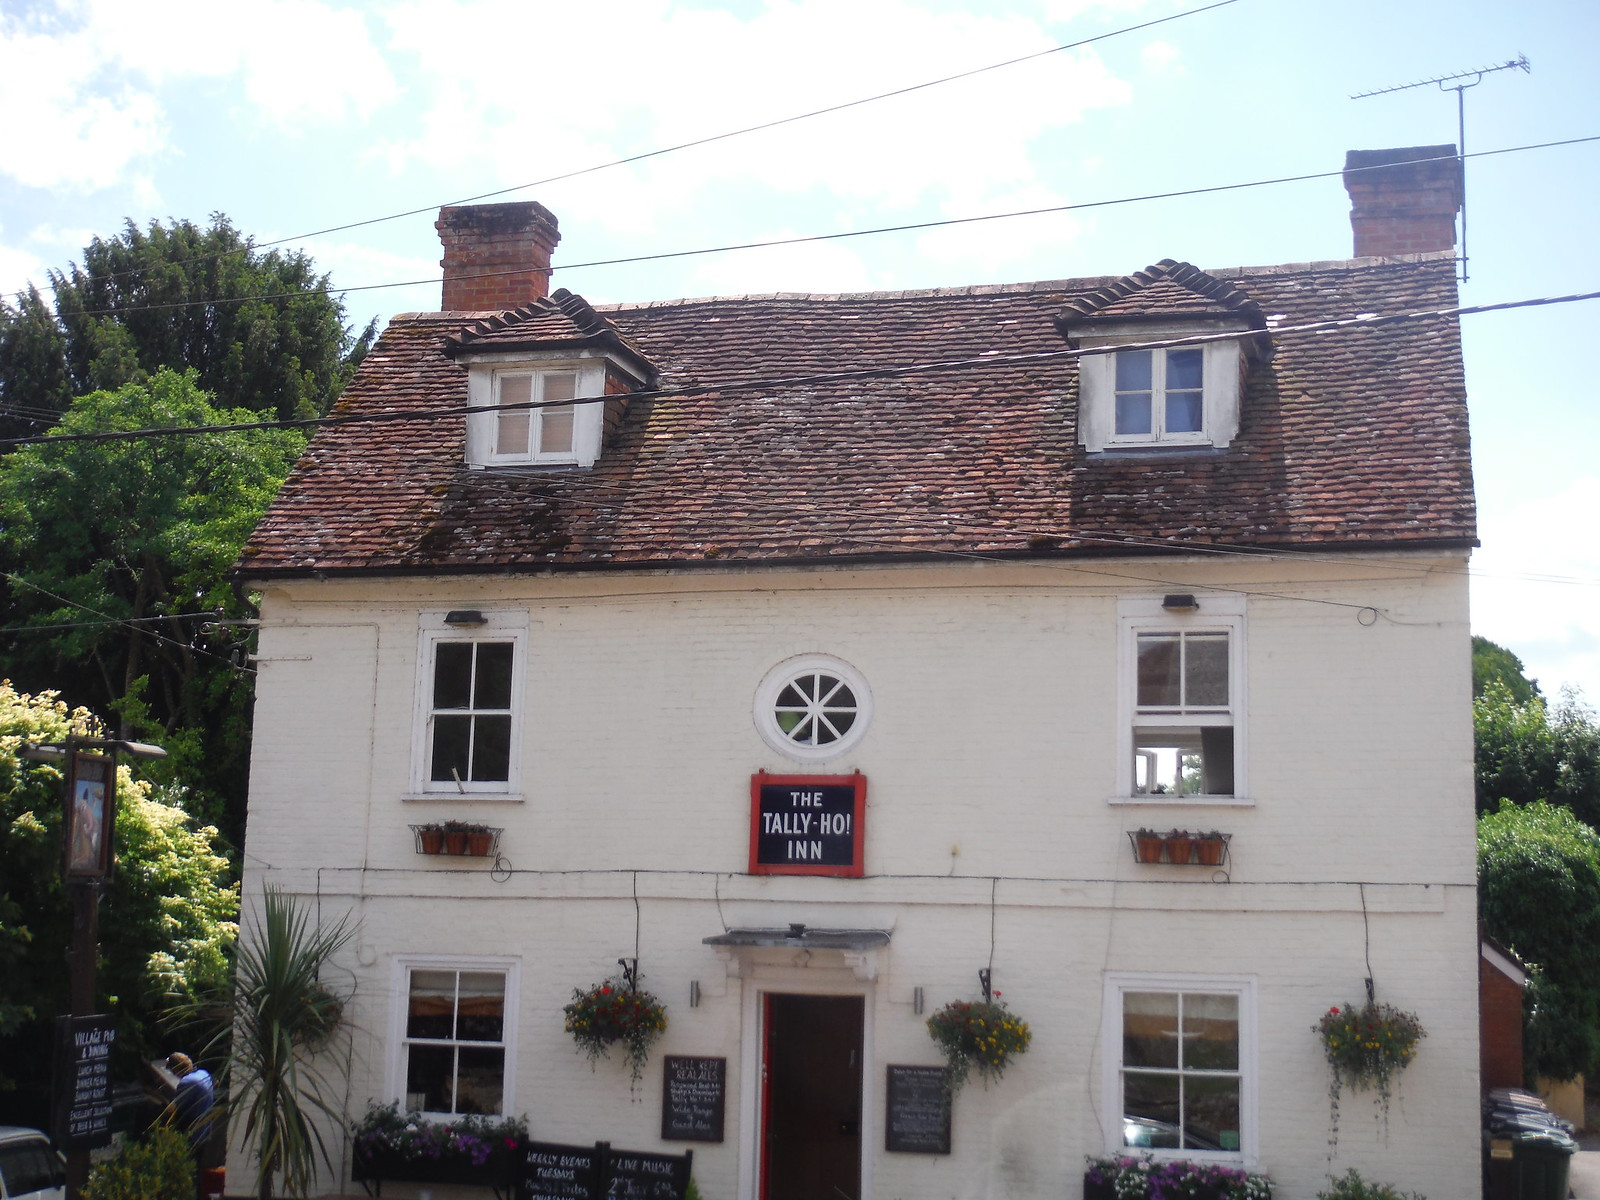 Tally Ho! Inn, Broughton SWC Walk 265 - Dean to Mottisfont & Dunbridge